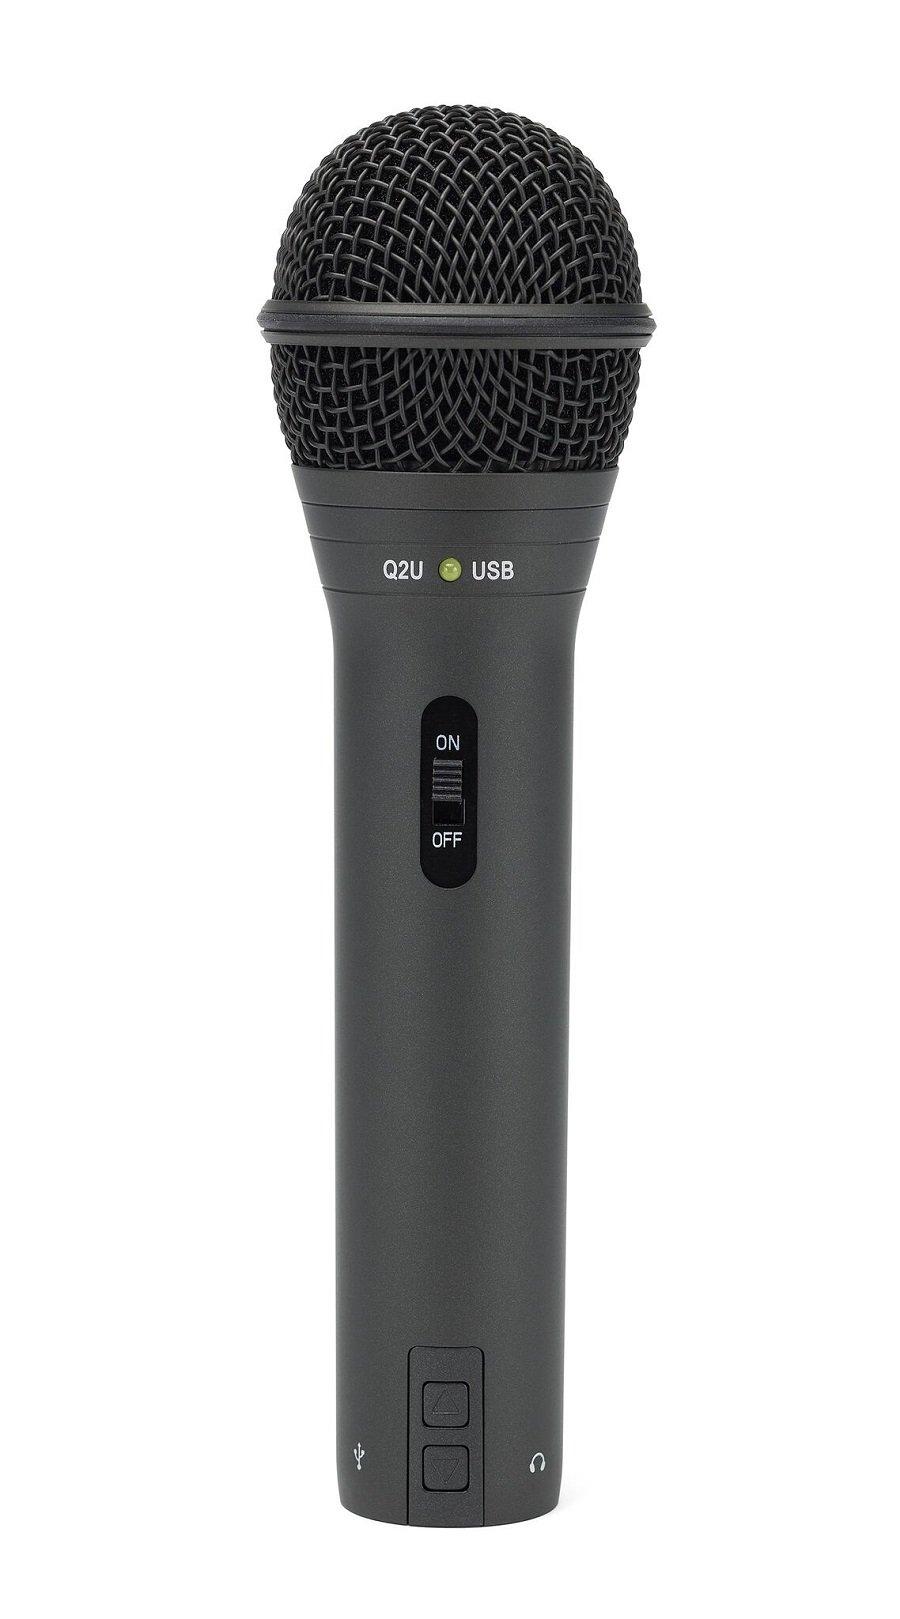 samson q2u handheld dynamic usb microphone recording and podcasting pack techadict. Black Bedroom Furniture Sets. Home Design Ideas